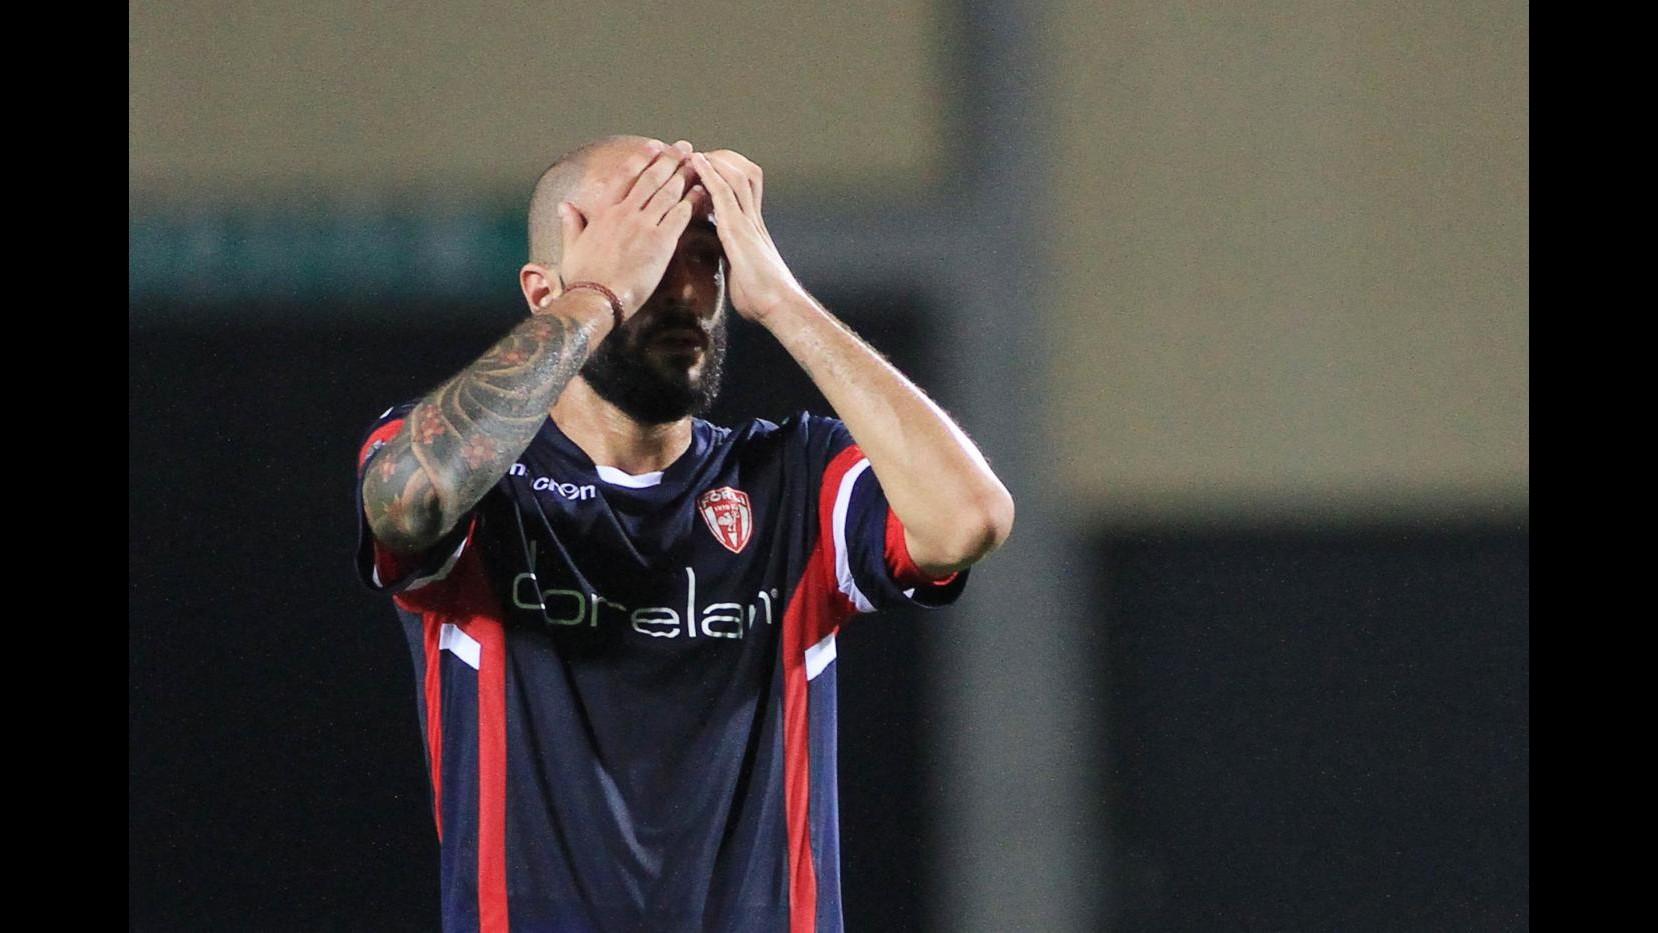 FOTO LegaPro, Padova-Forlì 2-0